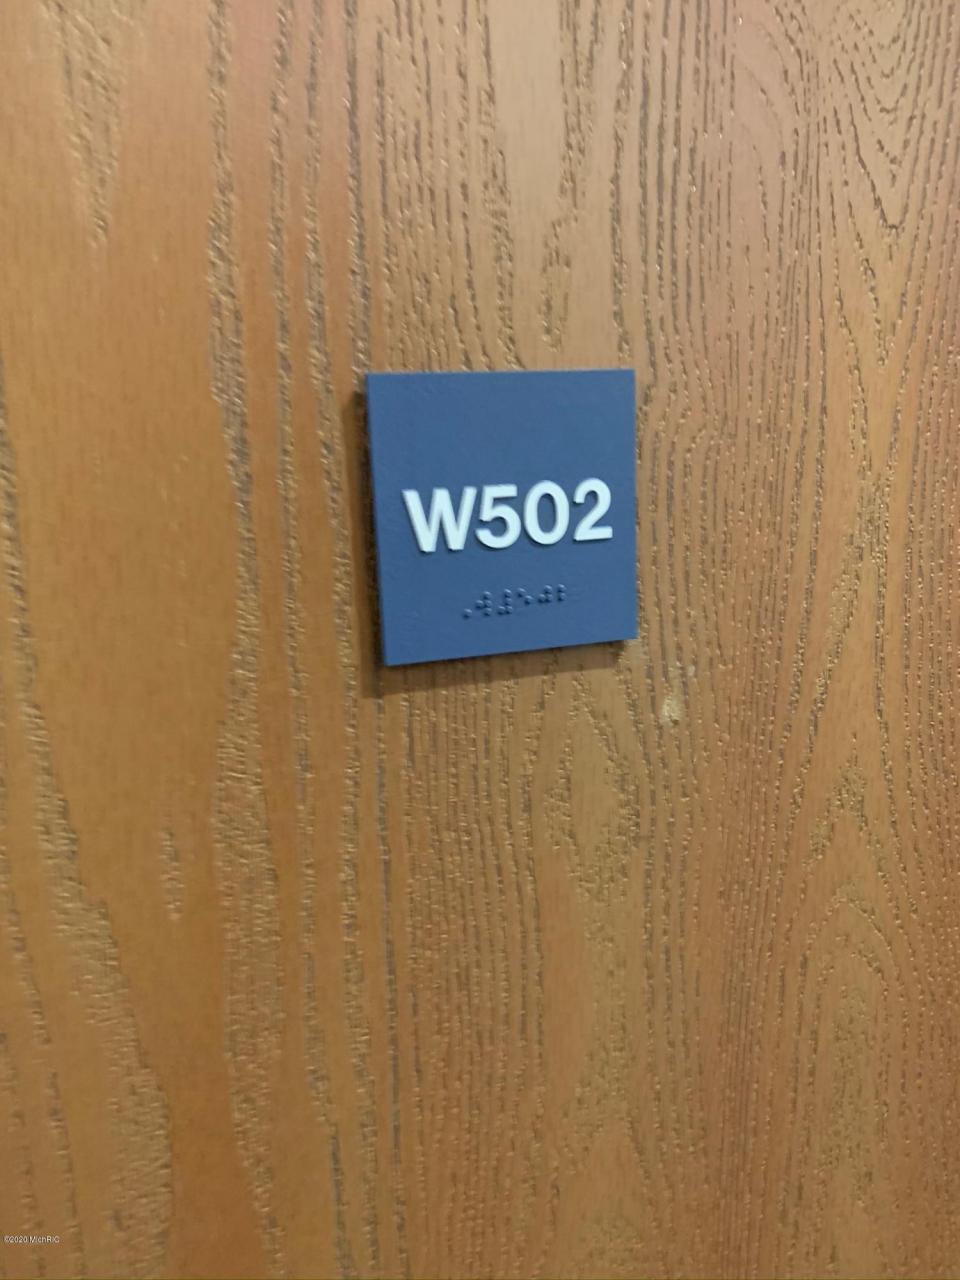 2964 Lakeshore W502 Dr Muskegon MI 49441